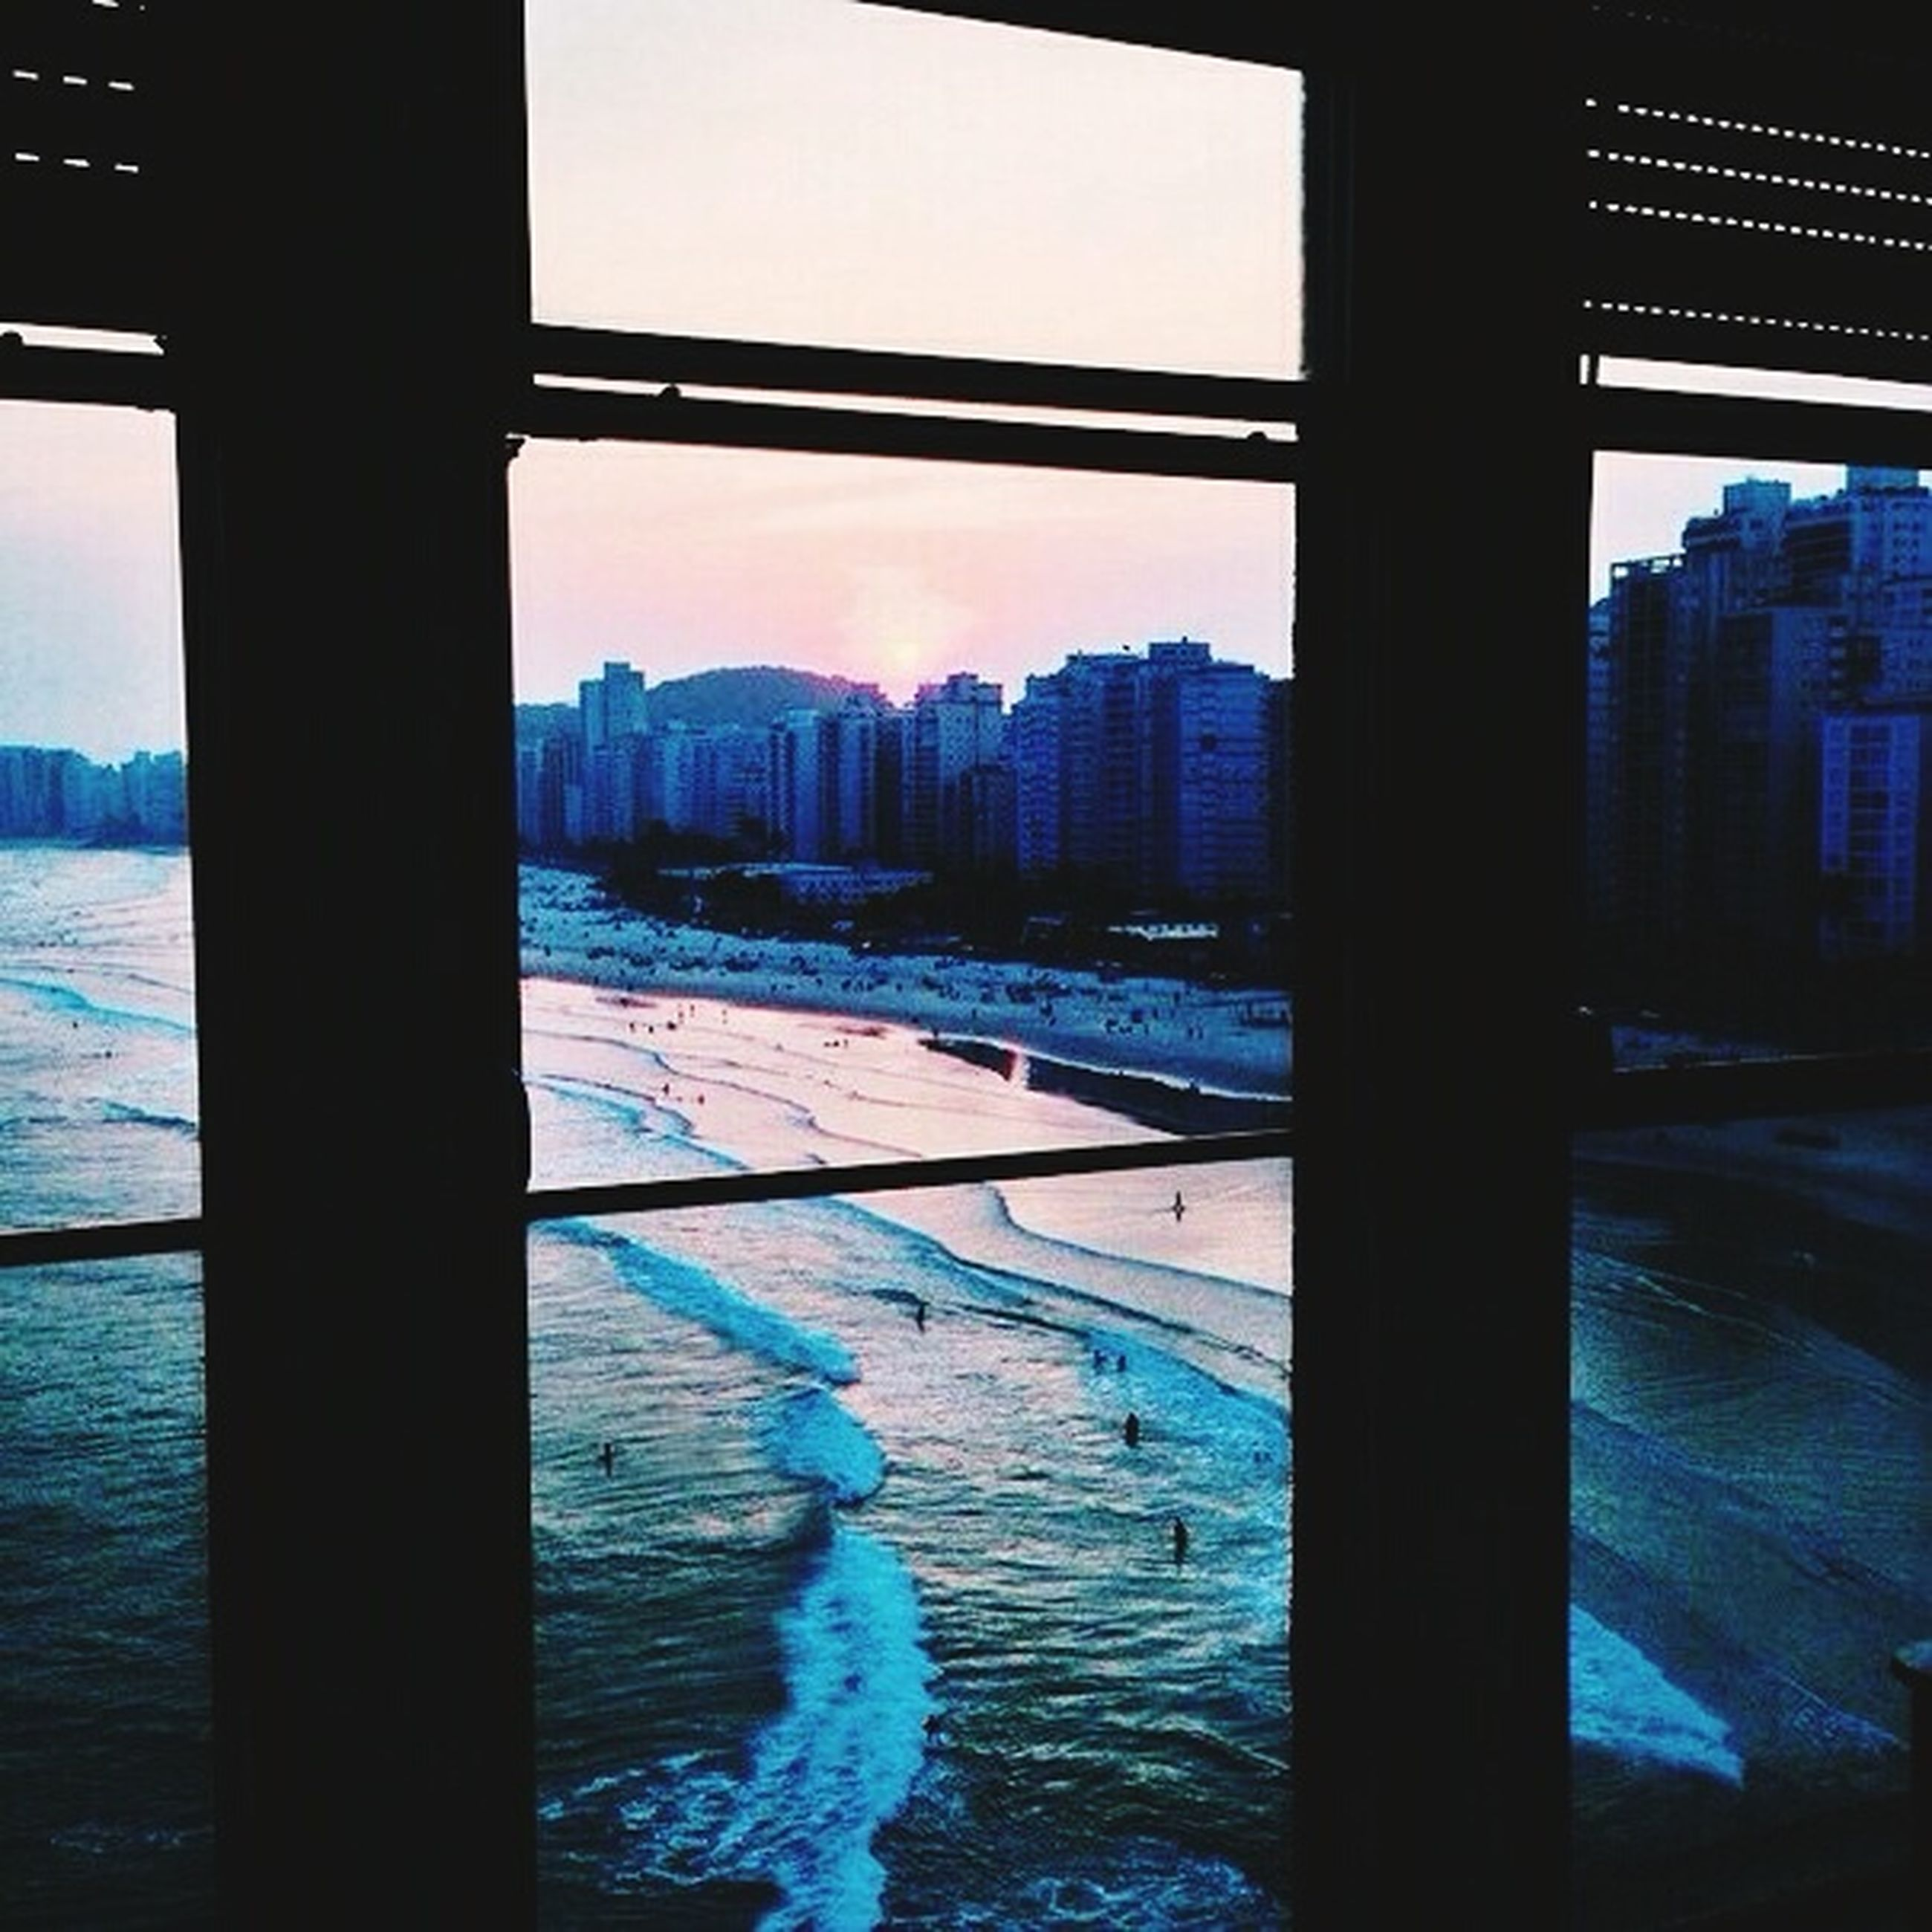 architecture, built structure, water, building exterior, city, sea, river, waterfront, bridge - man made structure, sky, cityscape, connection, sunset, transportation, rippled, bridge, reflection, dusk, illuminated, travel destinations